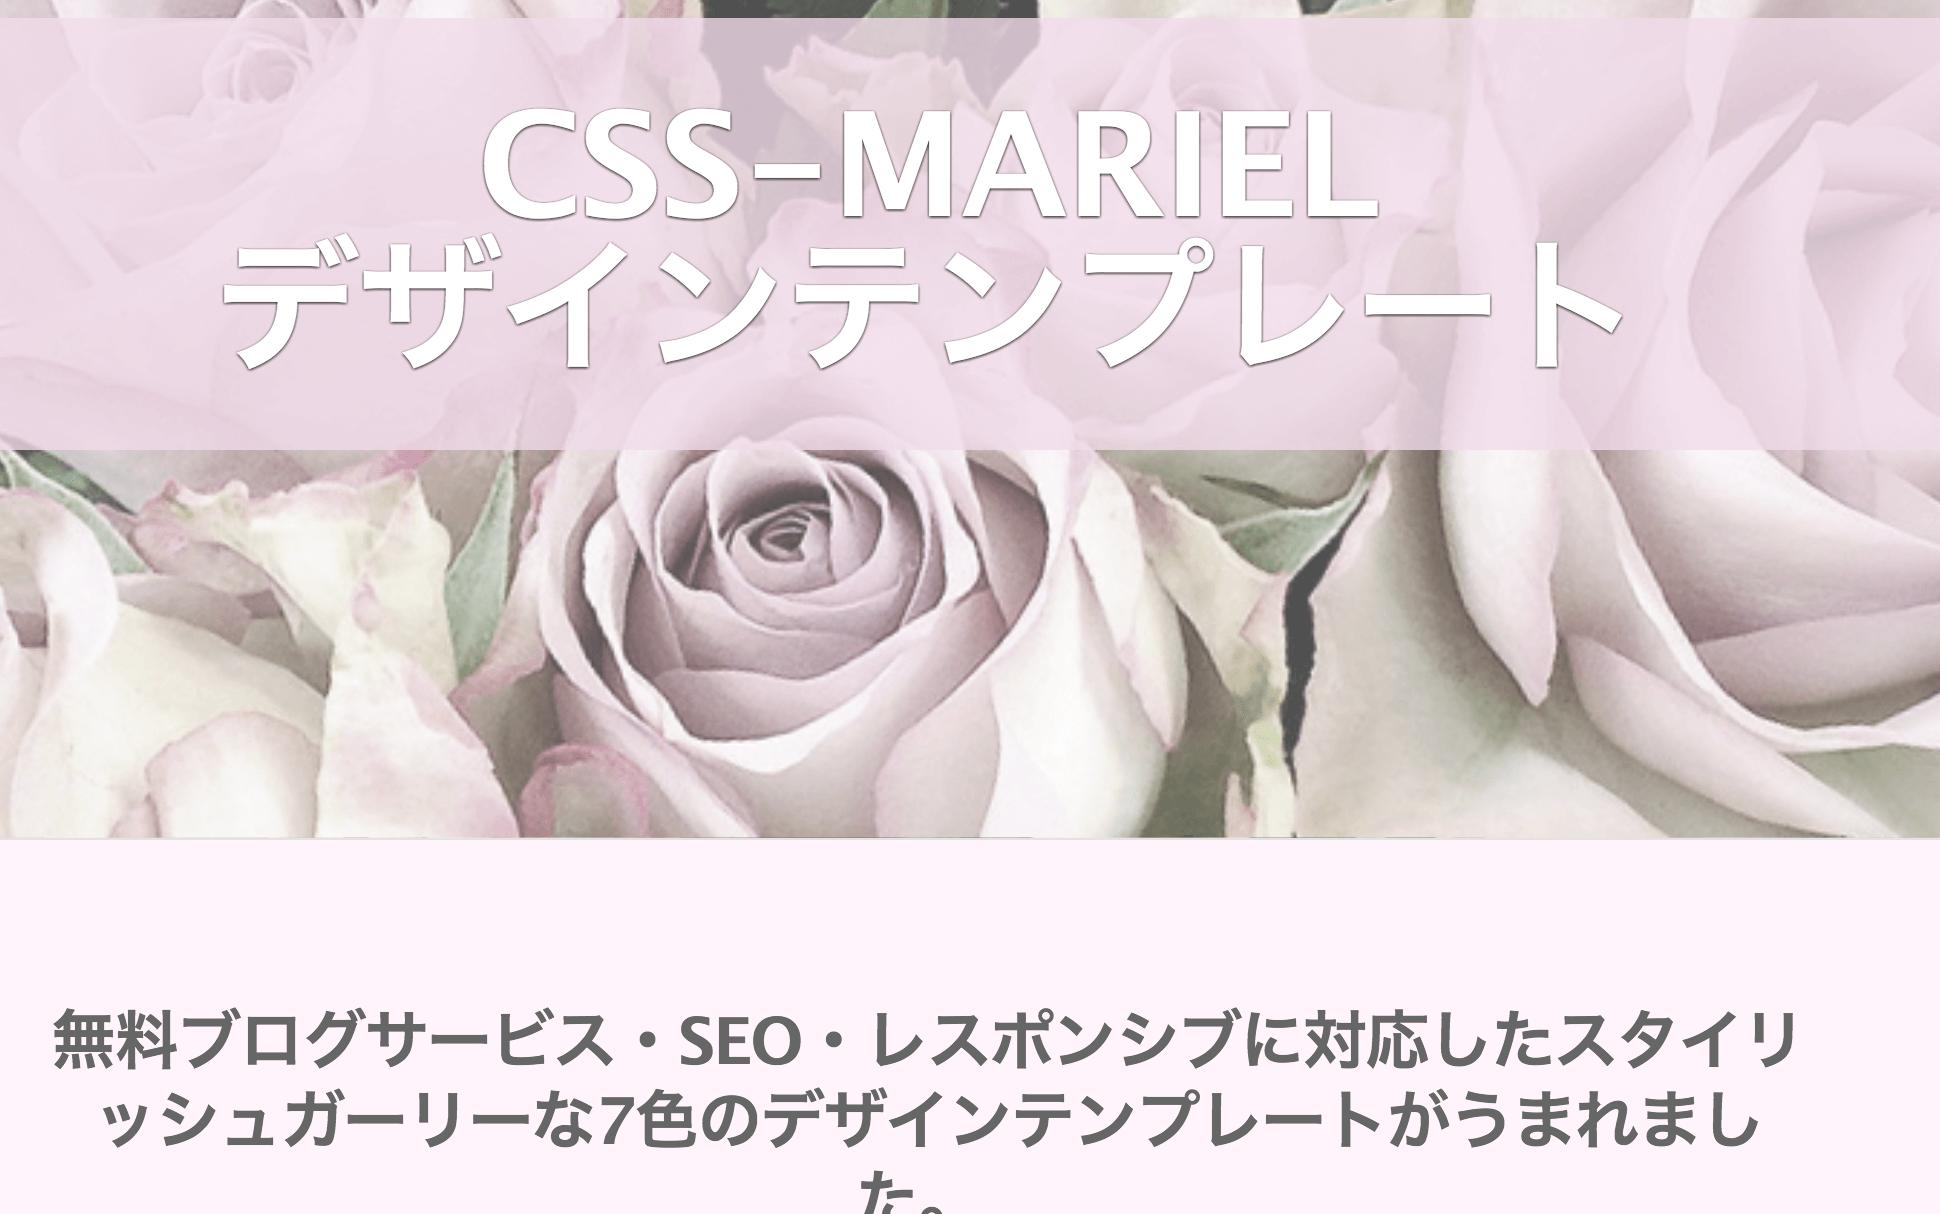 CSS-MARIELデザインテンプレート豪華特典付き評判レビュー